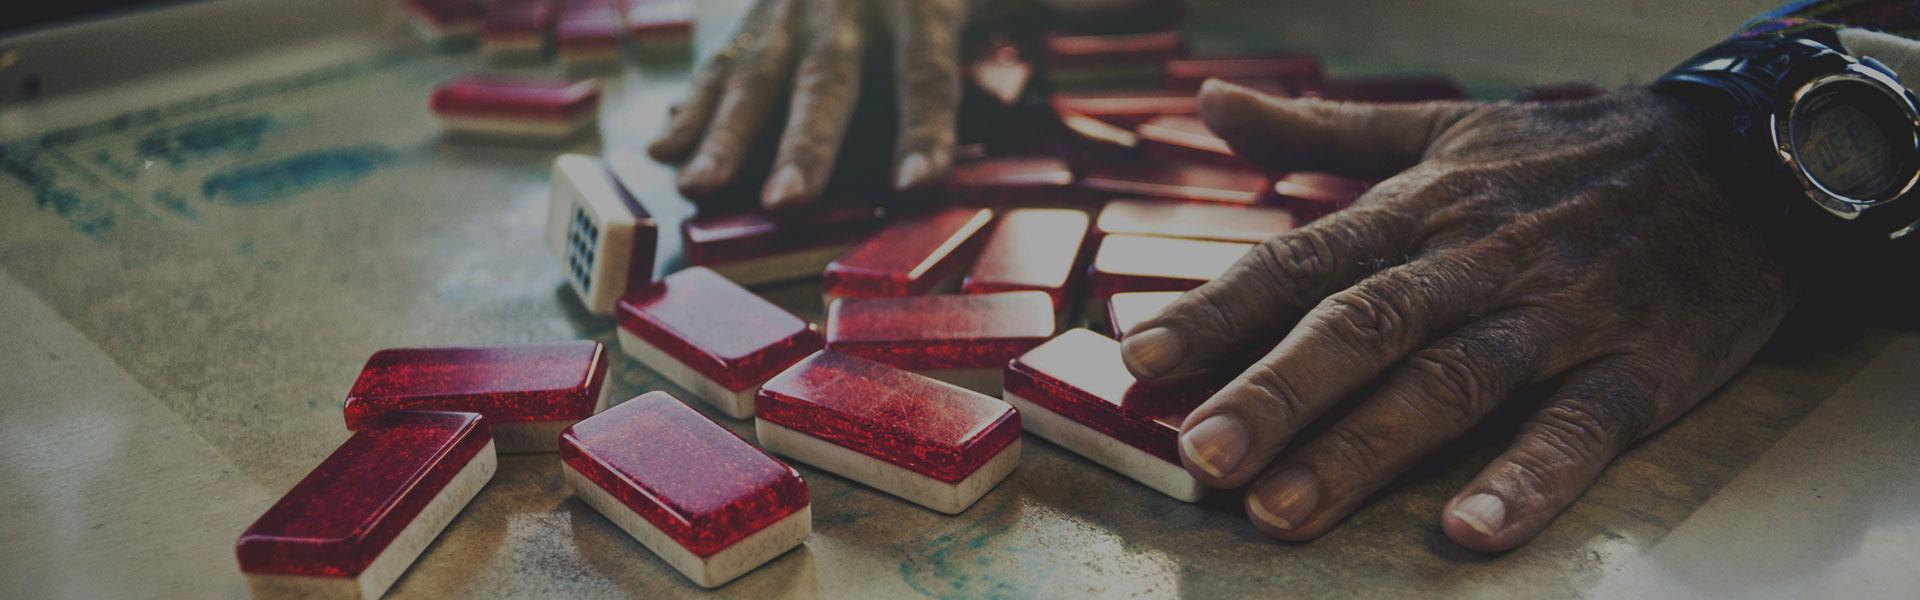 Playing dominos in Little Havana